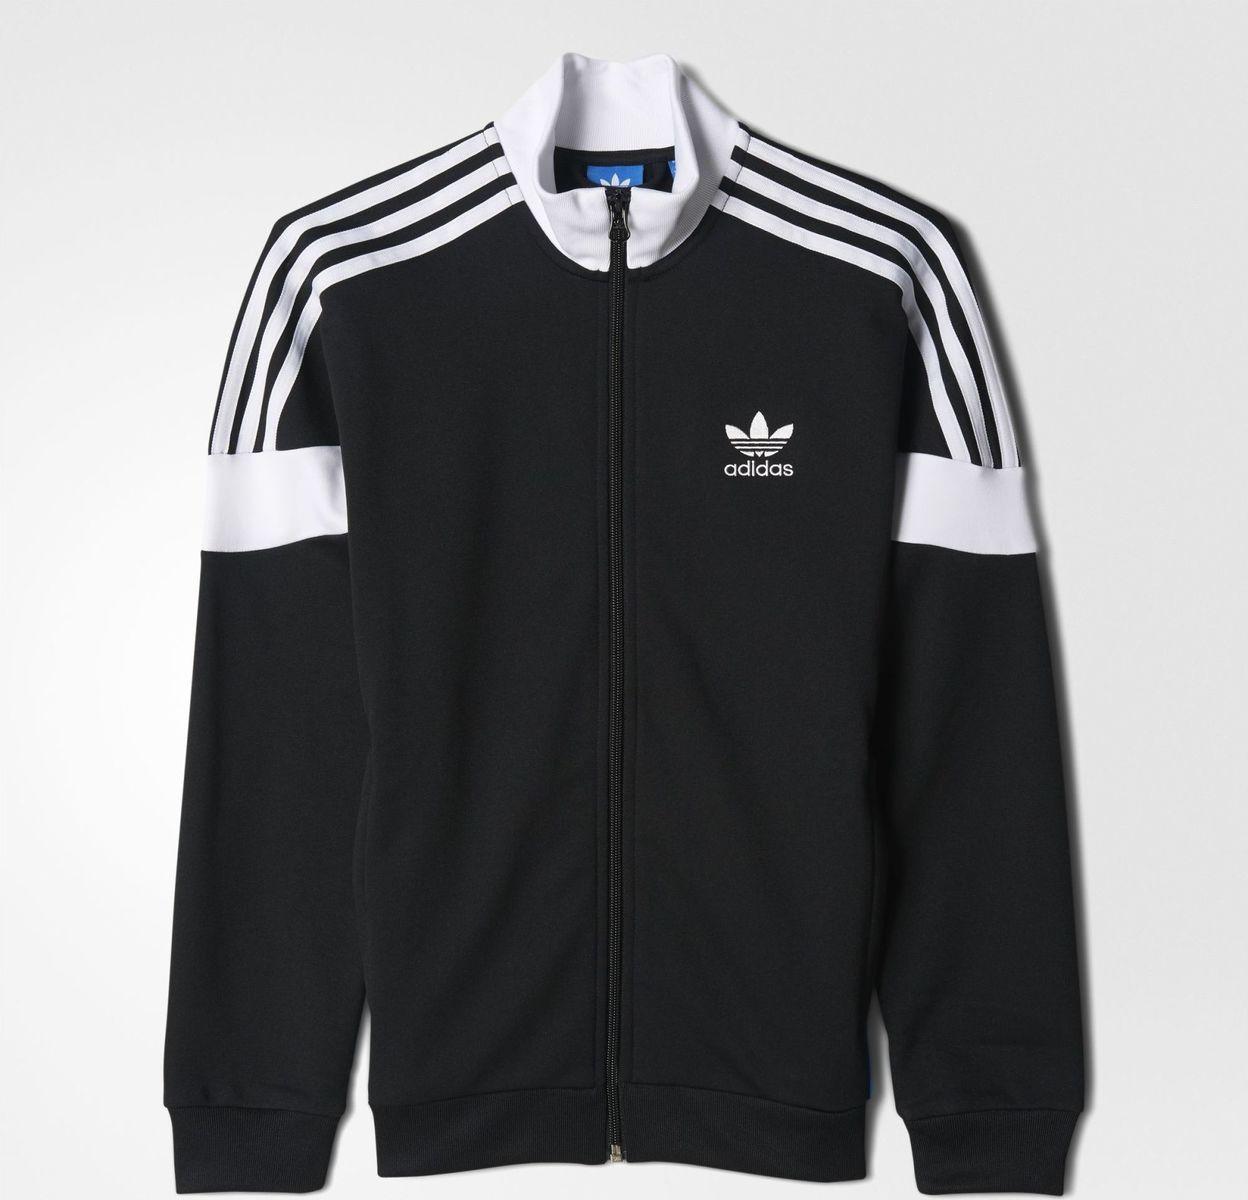 Bambino New New Sport Felpa Felpa Adidas Adidas Bambino Tl13FJcK